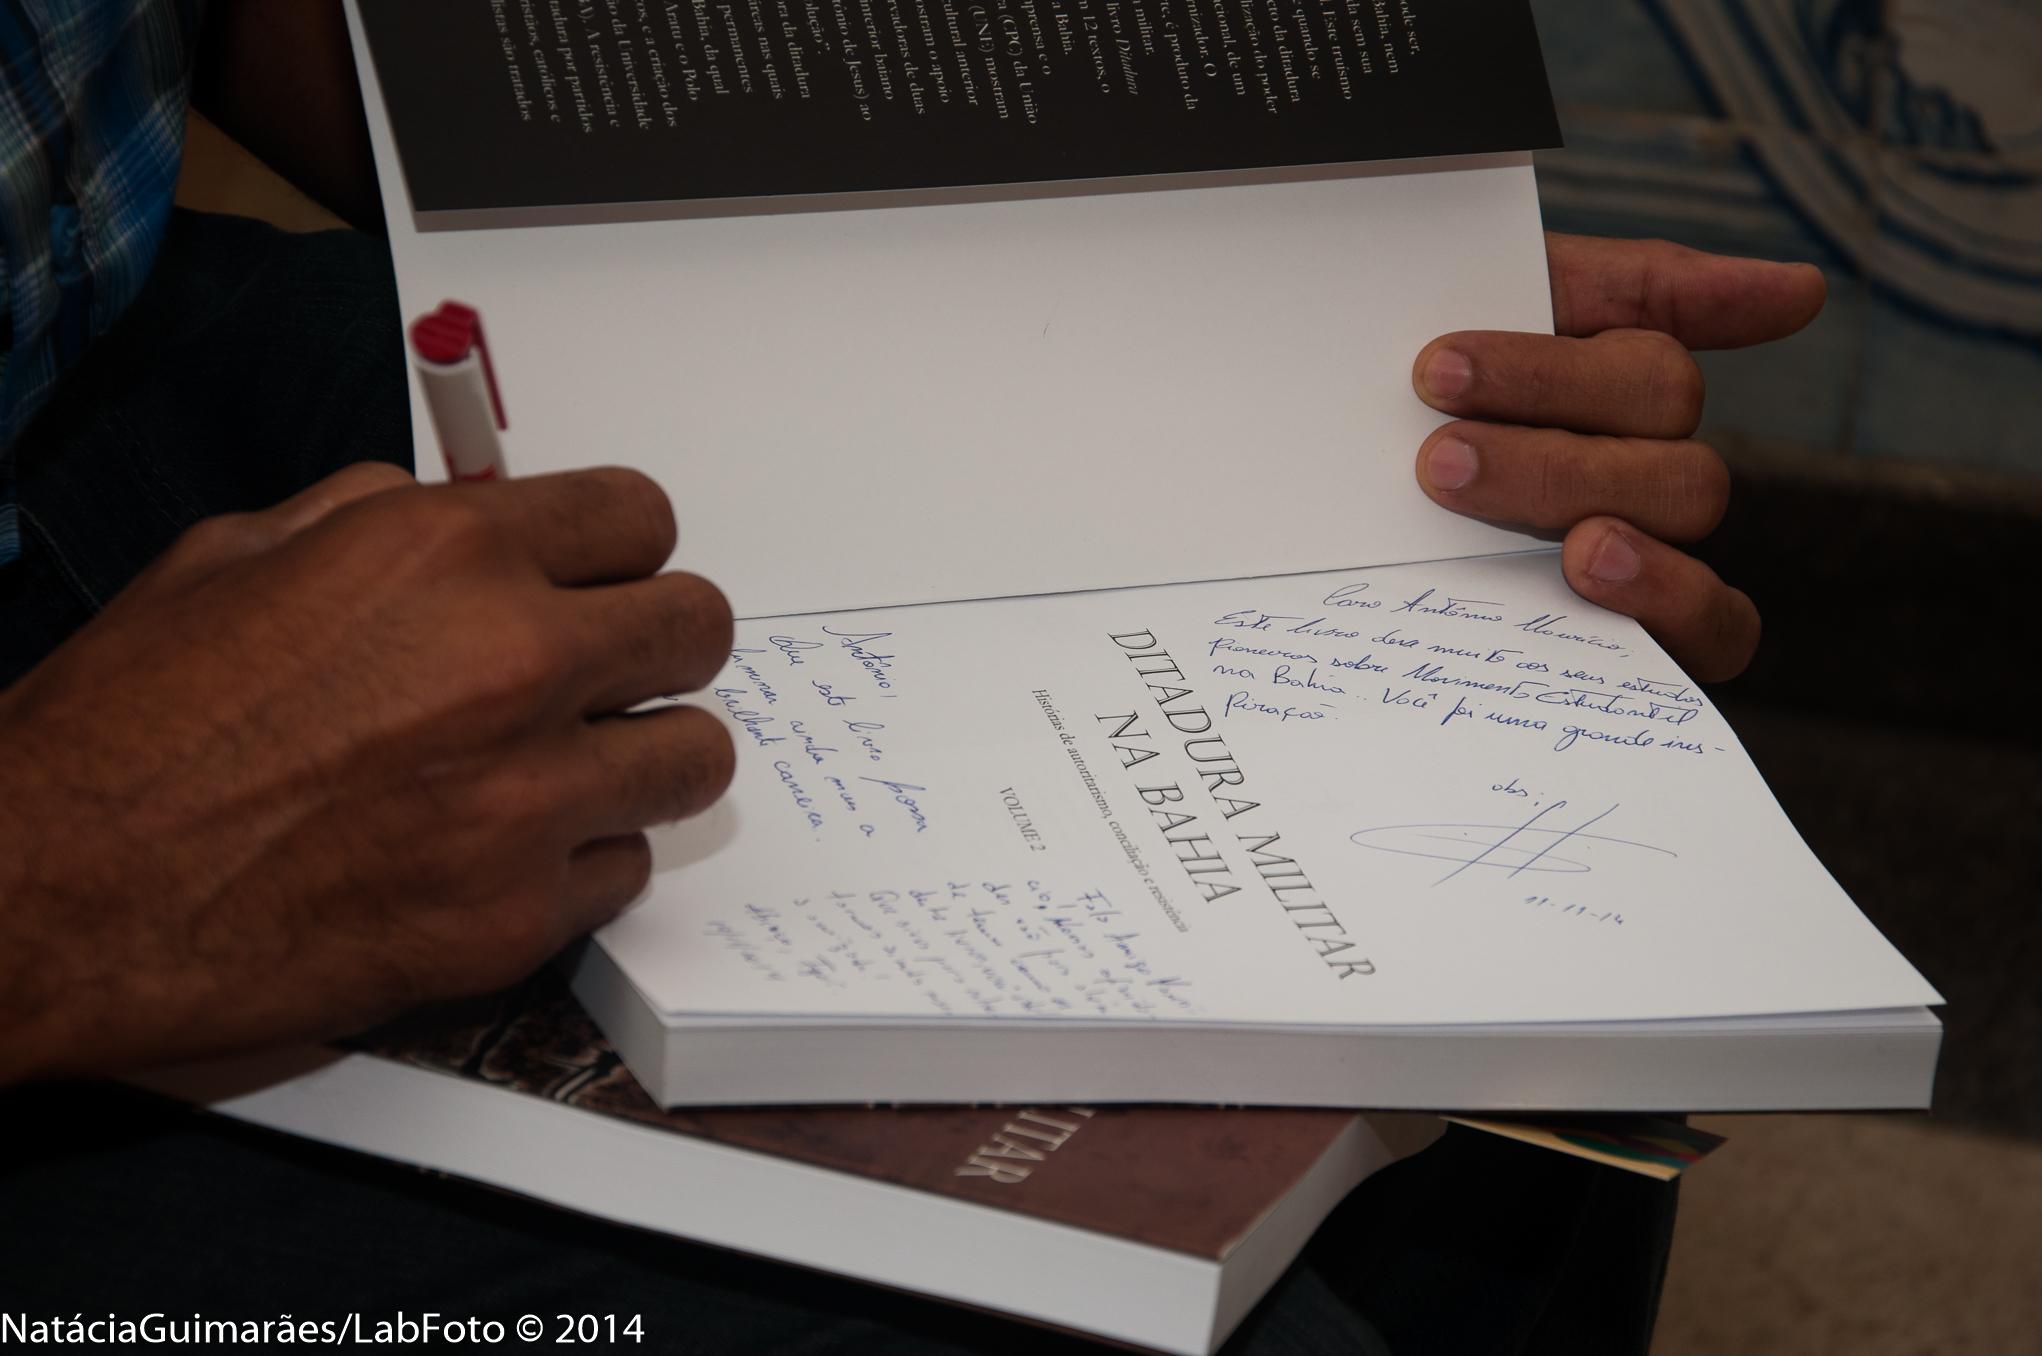 lançamentoedufba_nataciaguimaraes_191114-14 - Copia - Copia